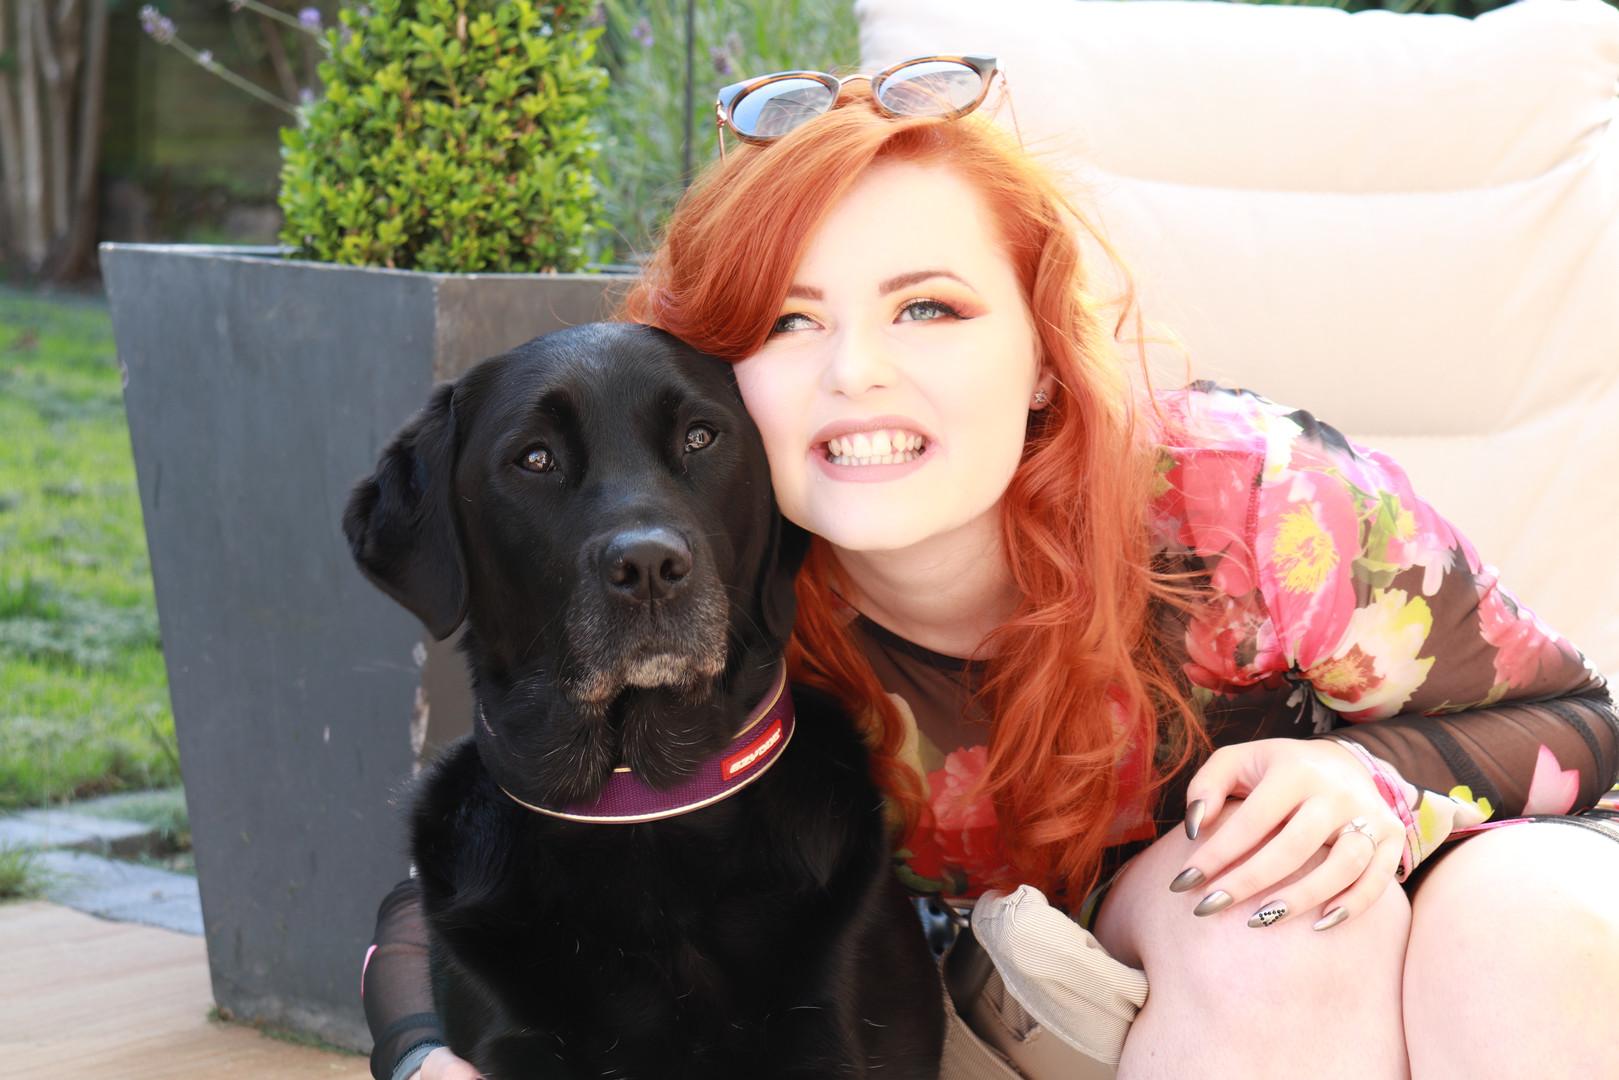 Lucy Edwards cuddling her black guide dog Olga